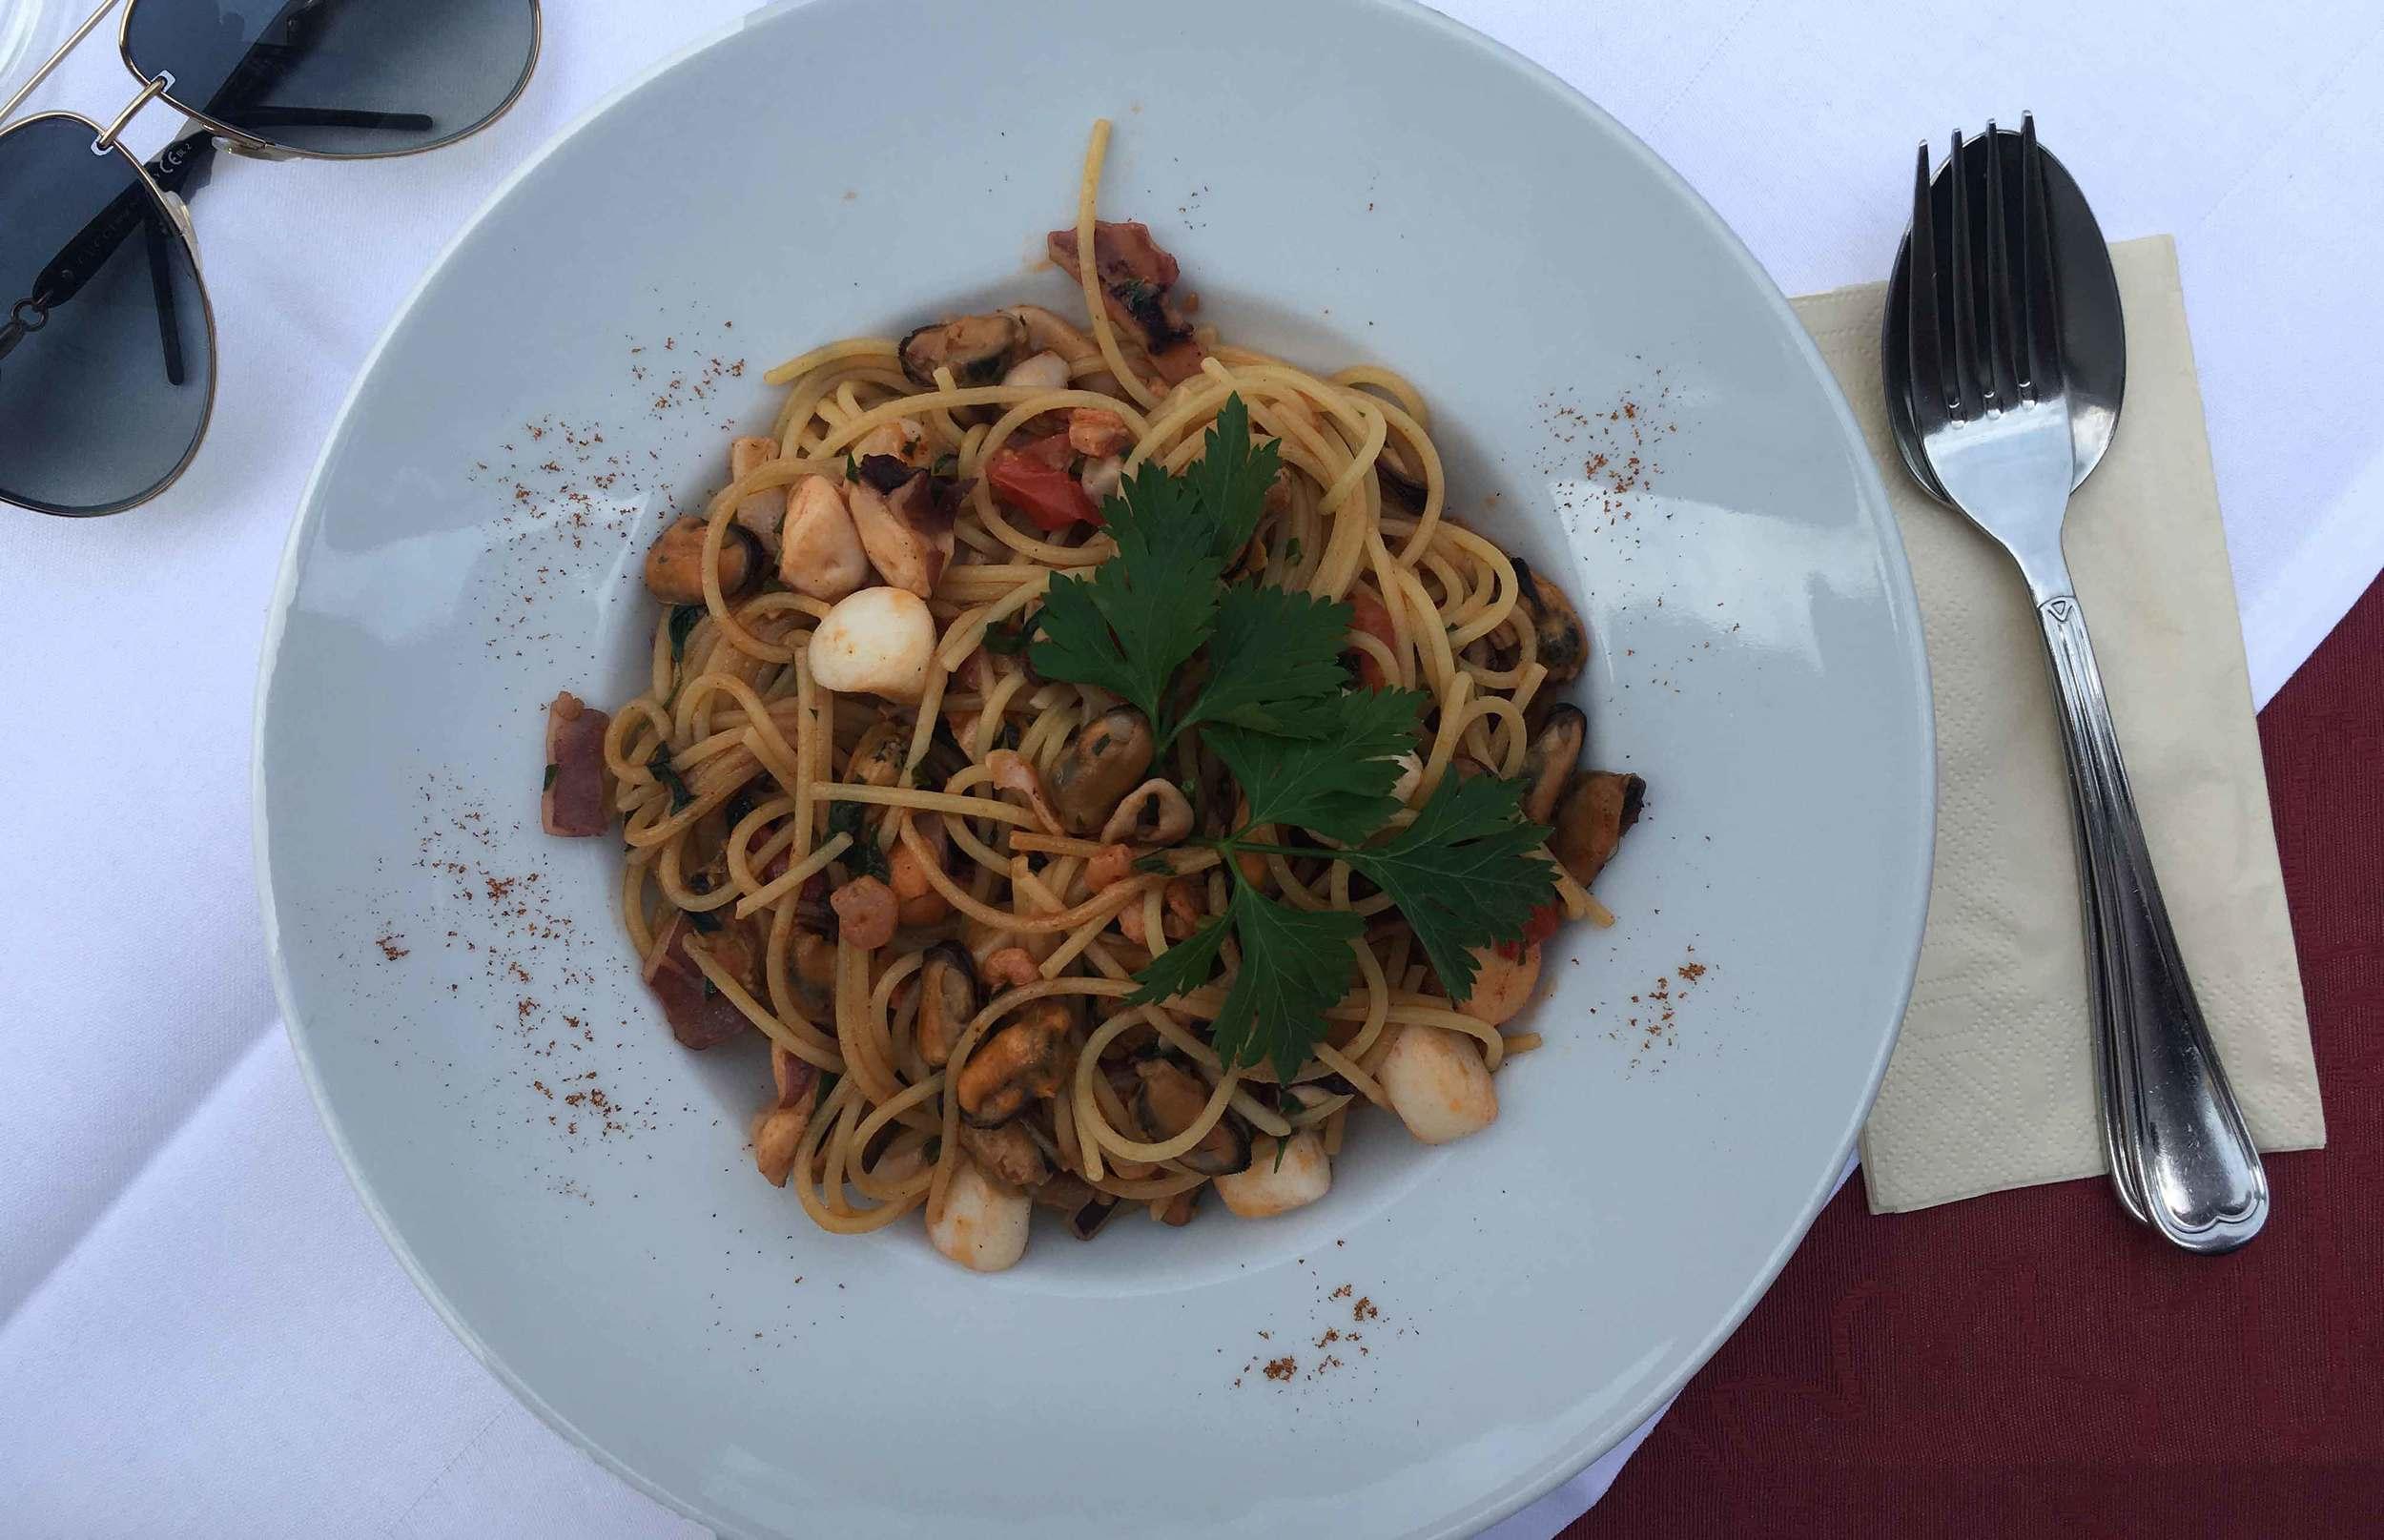 Pasta allo scoglio, seafood pasta, Italian restaurant, Baden Baden, Germany. Image©sourcingstyle.com